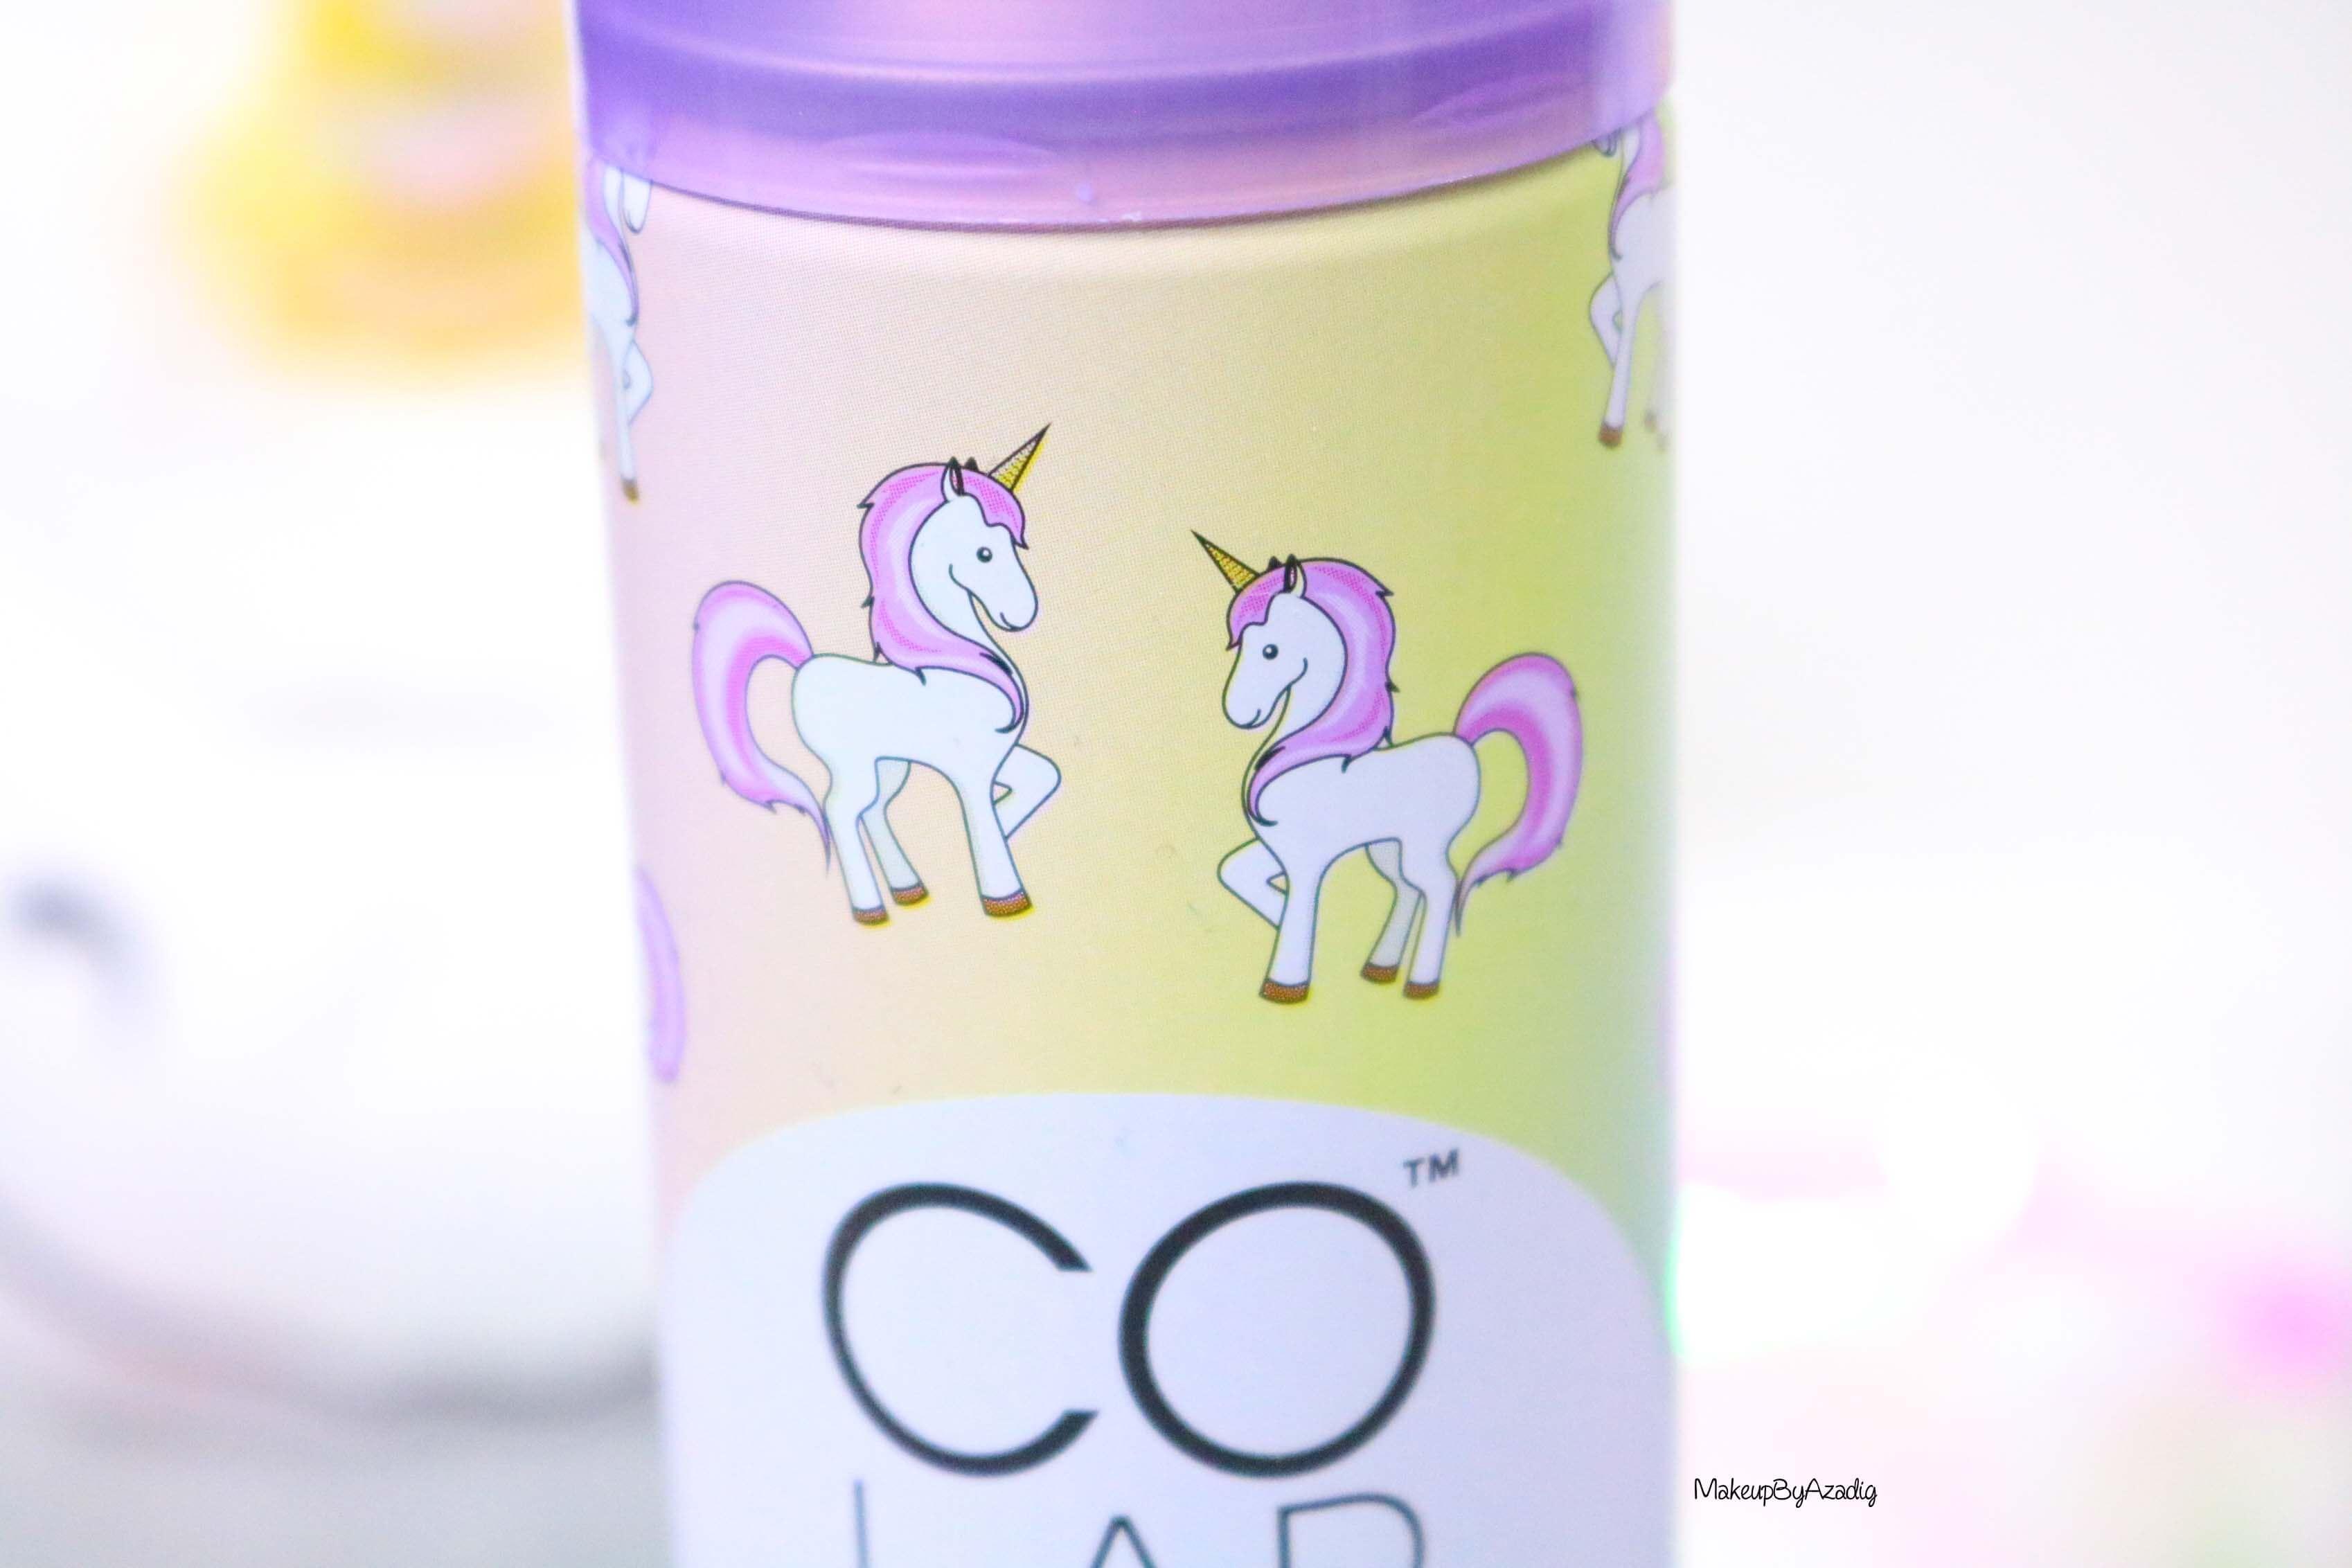 revue-shampooing-sec-colab-batiste-fresh-unicorn-monoprix-feelunique-prix-avis--soin-capillaire-efficacite-makeupbyazadig-licornes